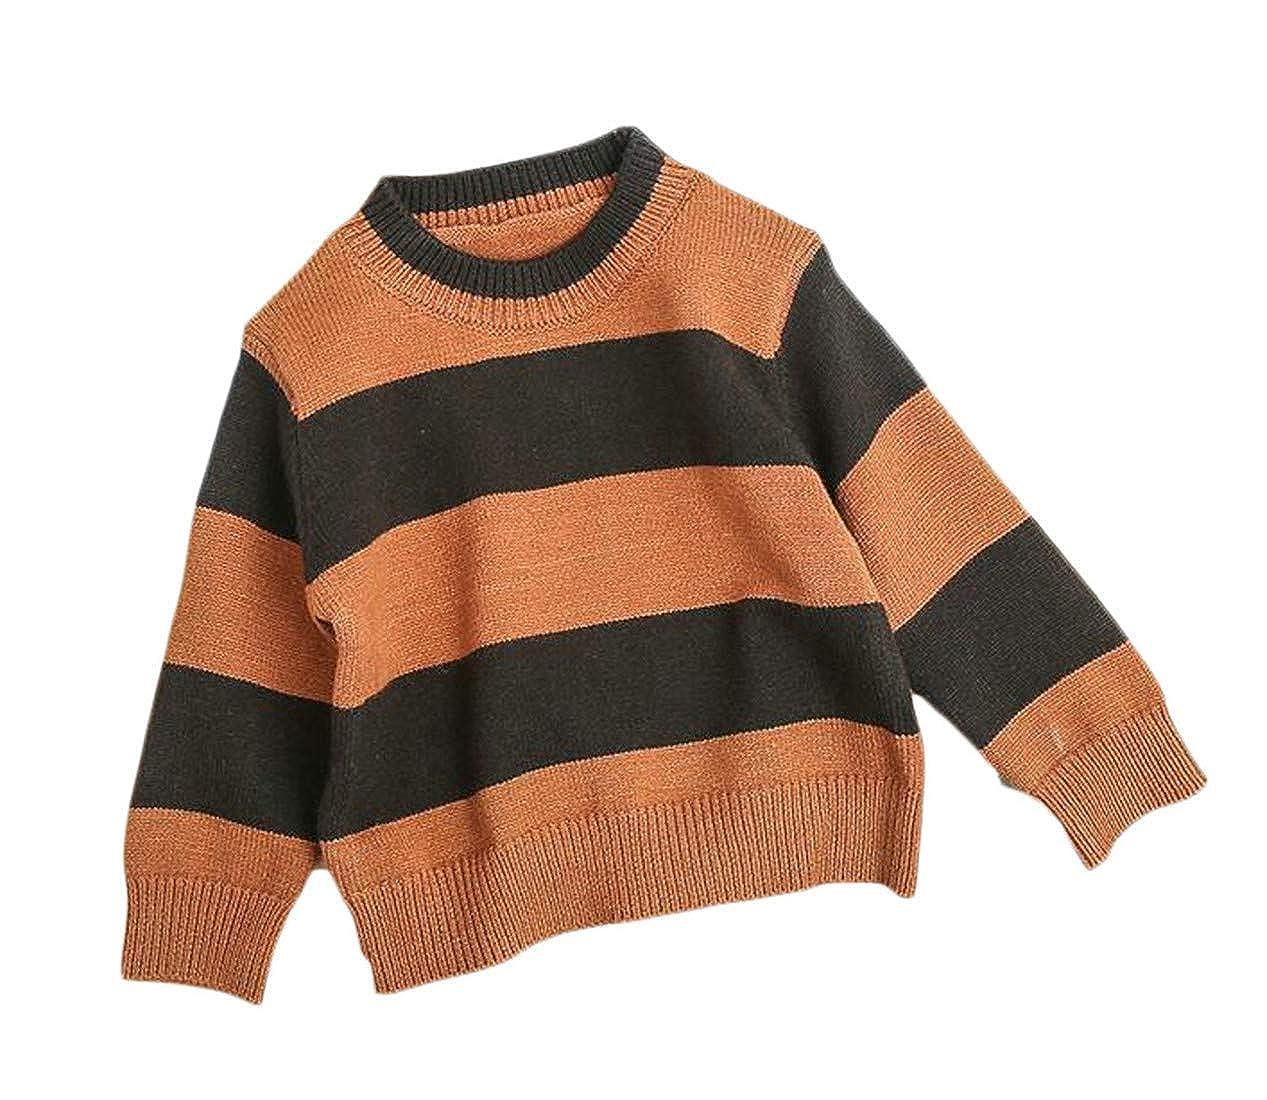 Joe Wenko Boys Striped Color Block Knit O-Neck Casual Pullover Sweaters